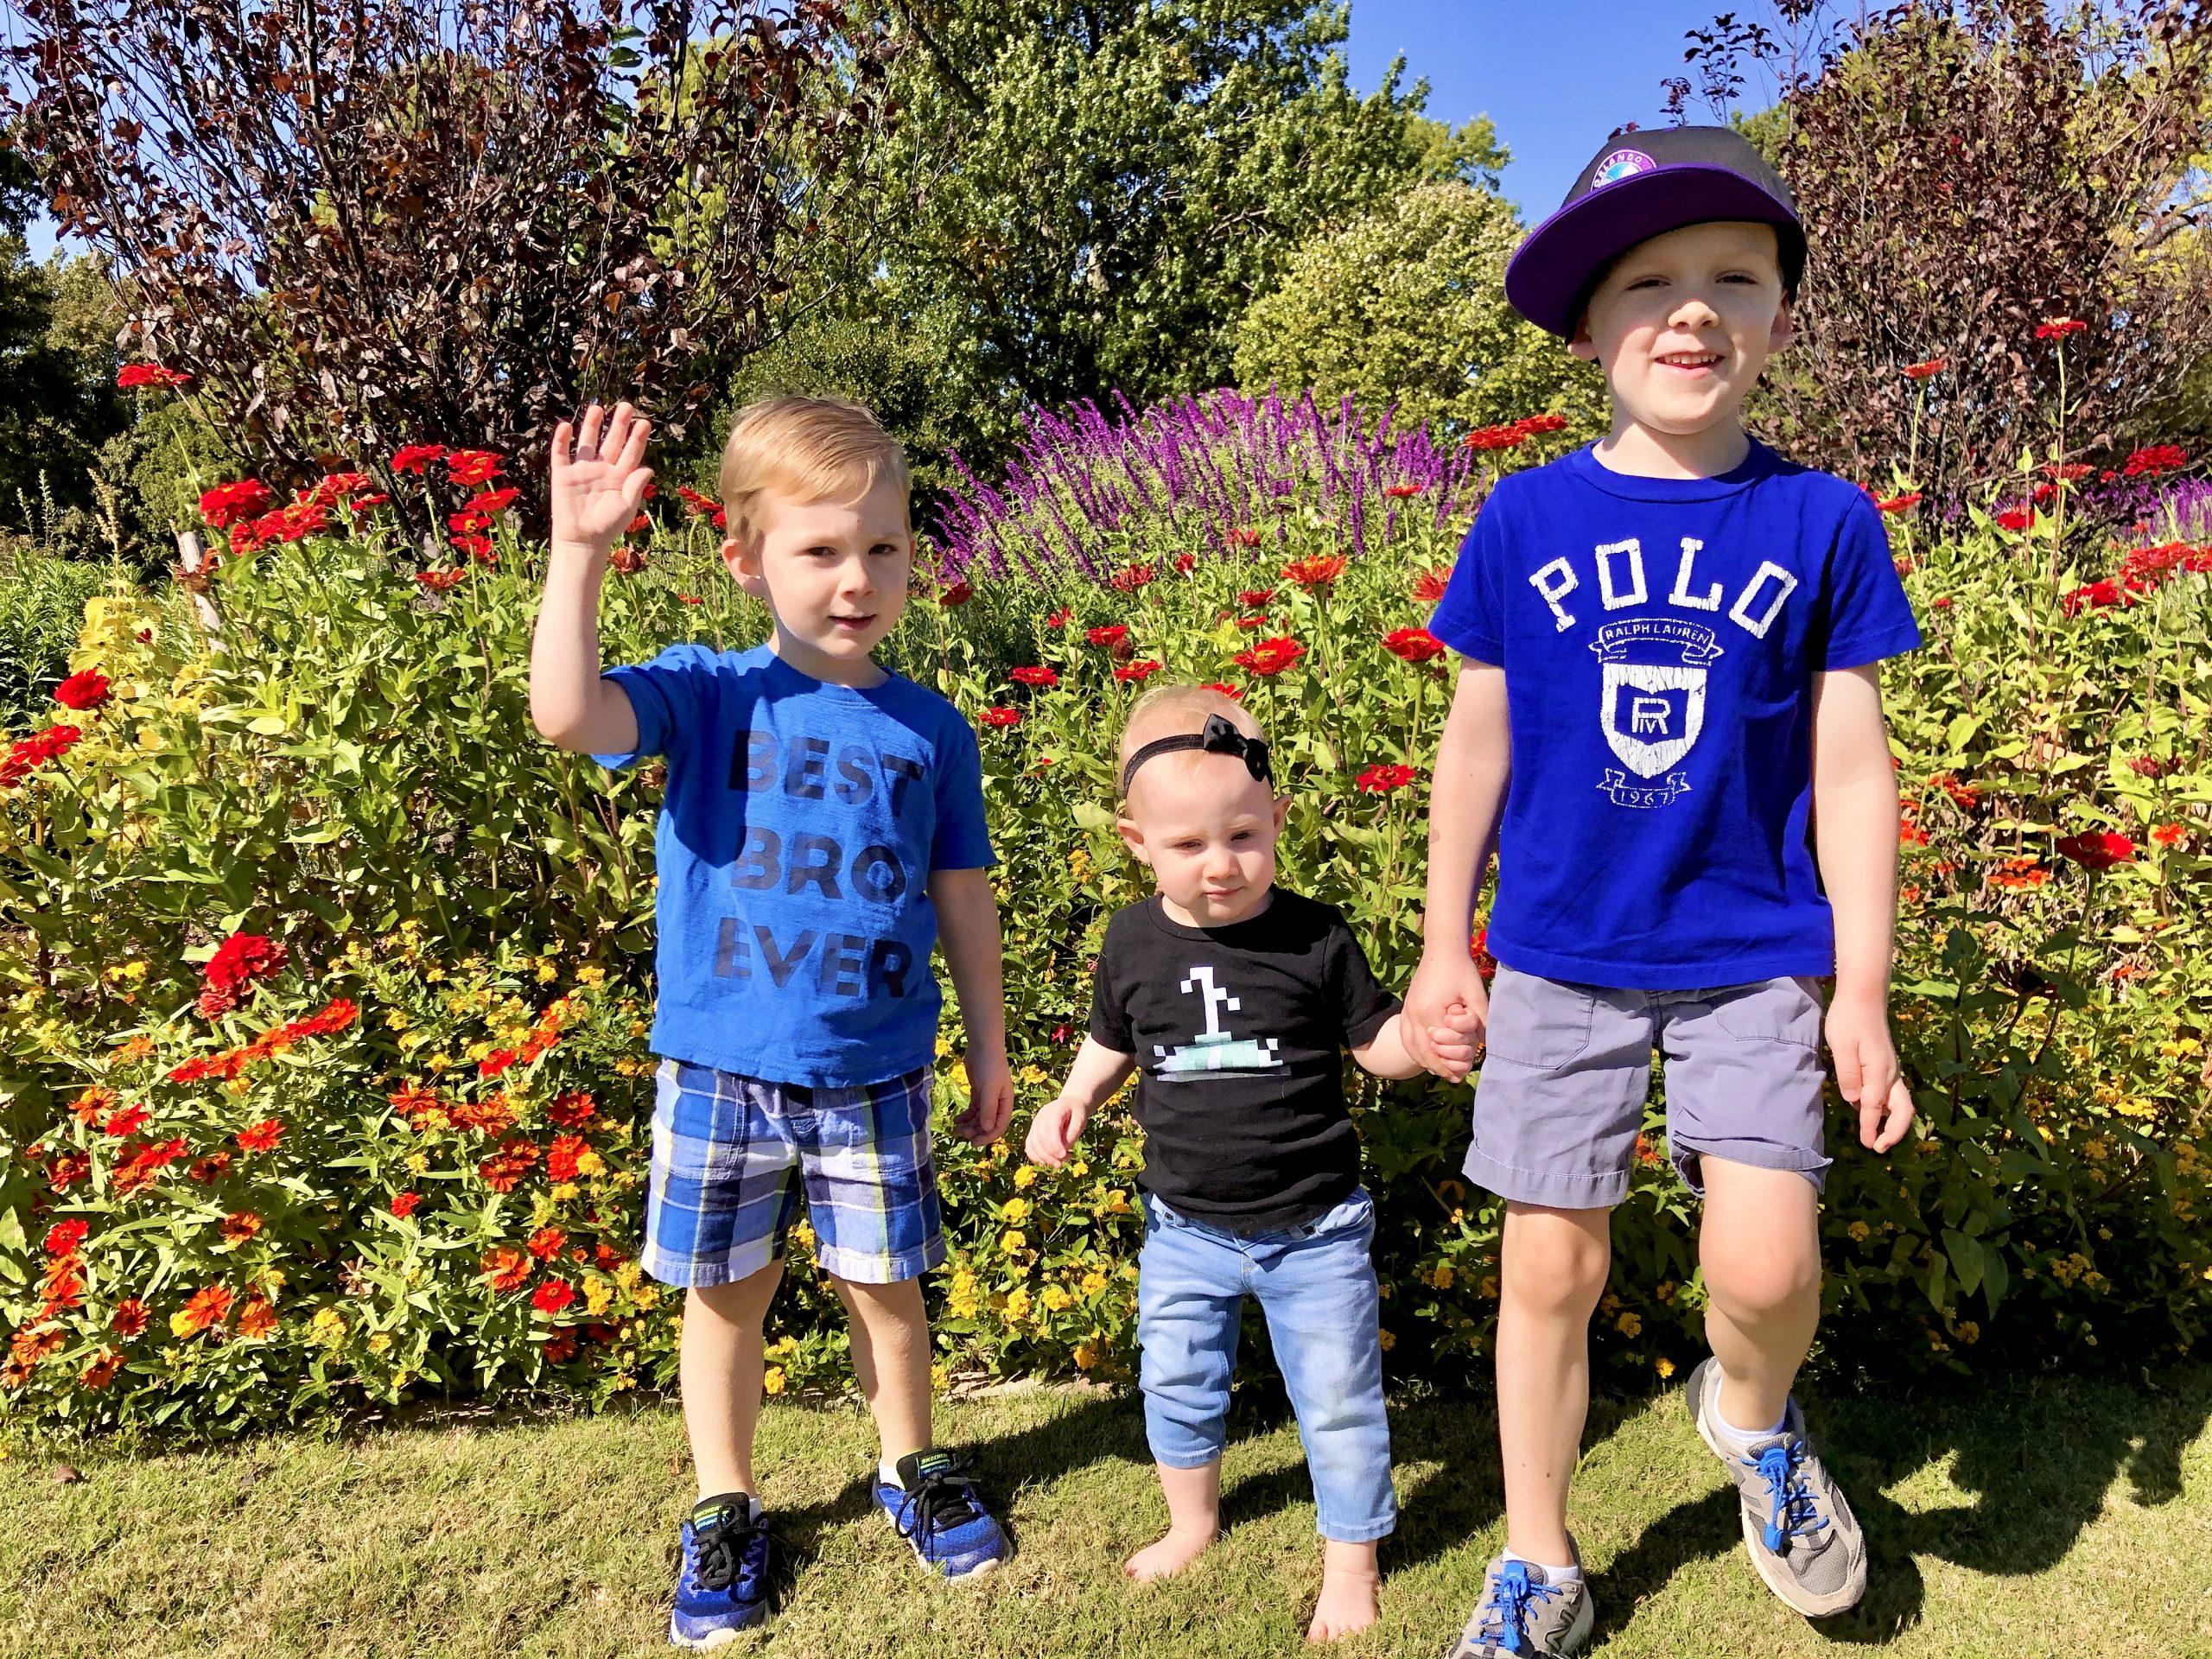 Best Family Photo Locations Around OKC - Will Rogers Gardens